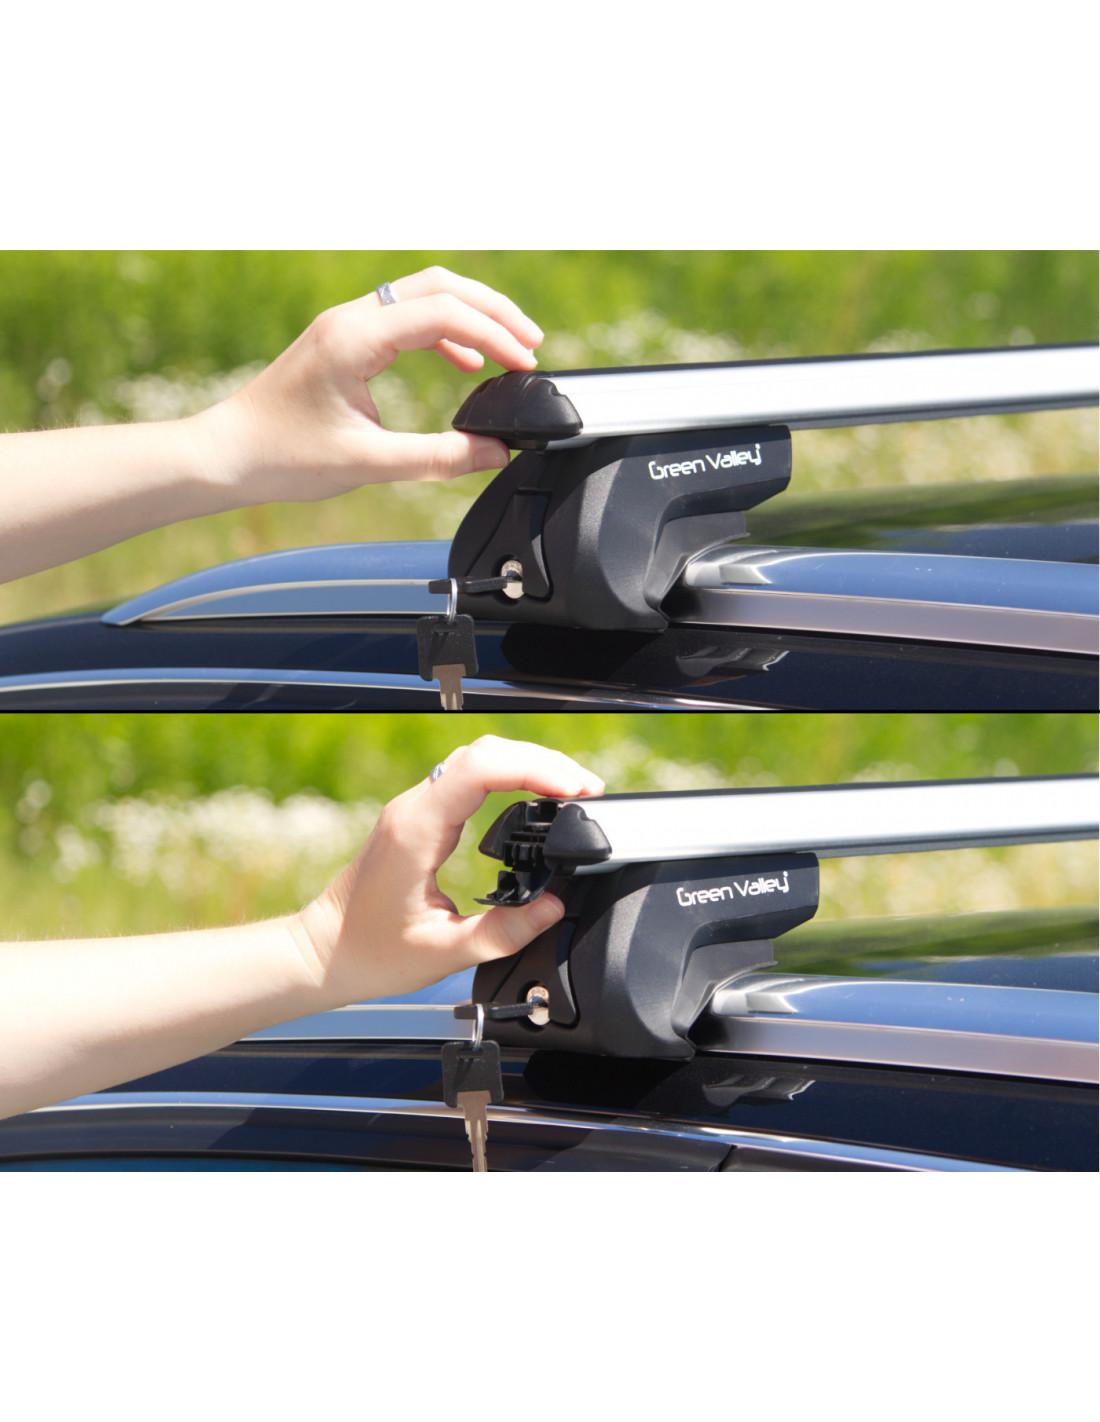 Hak Holowniczy Wypinany Chrysler Grand Voyager Stow N Go